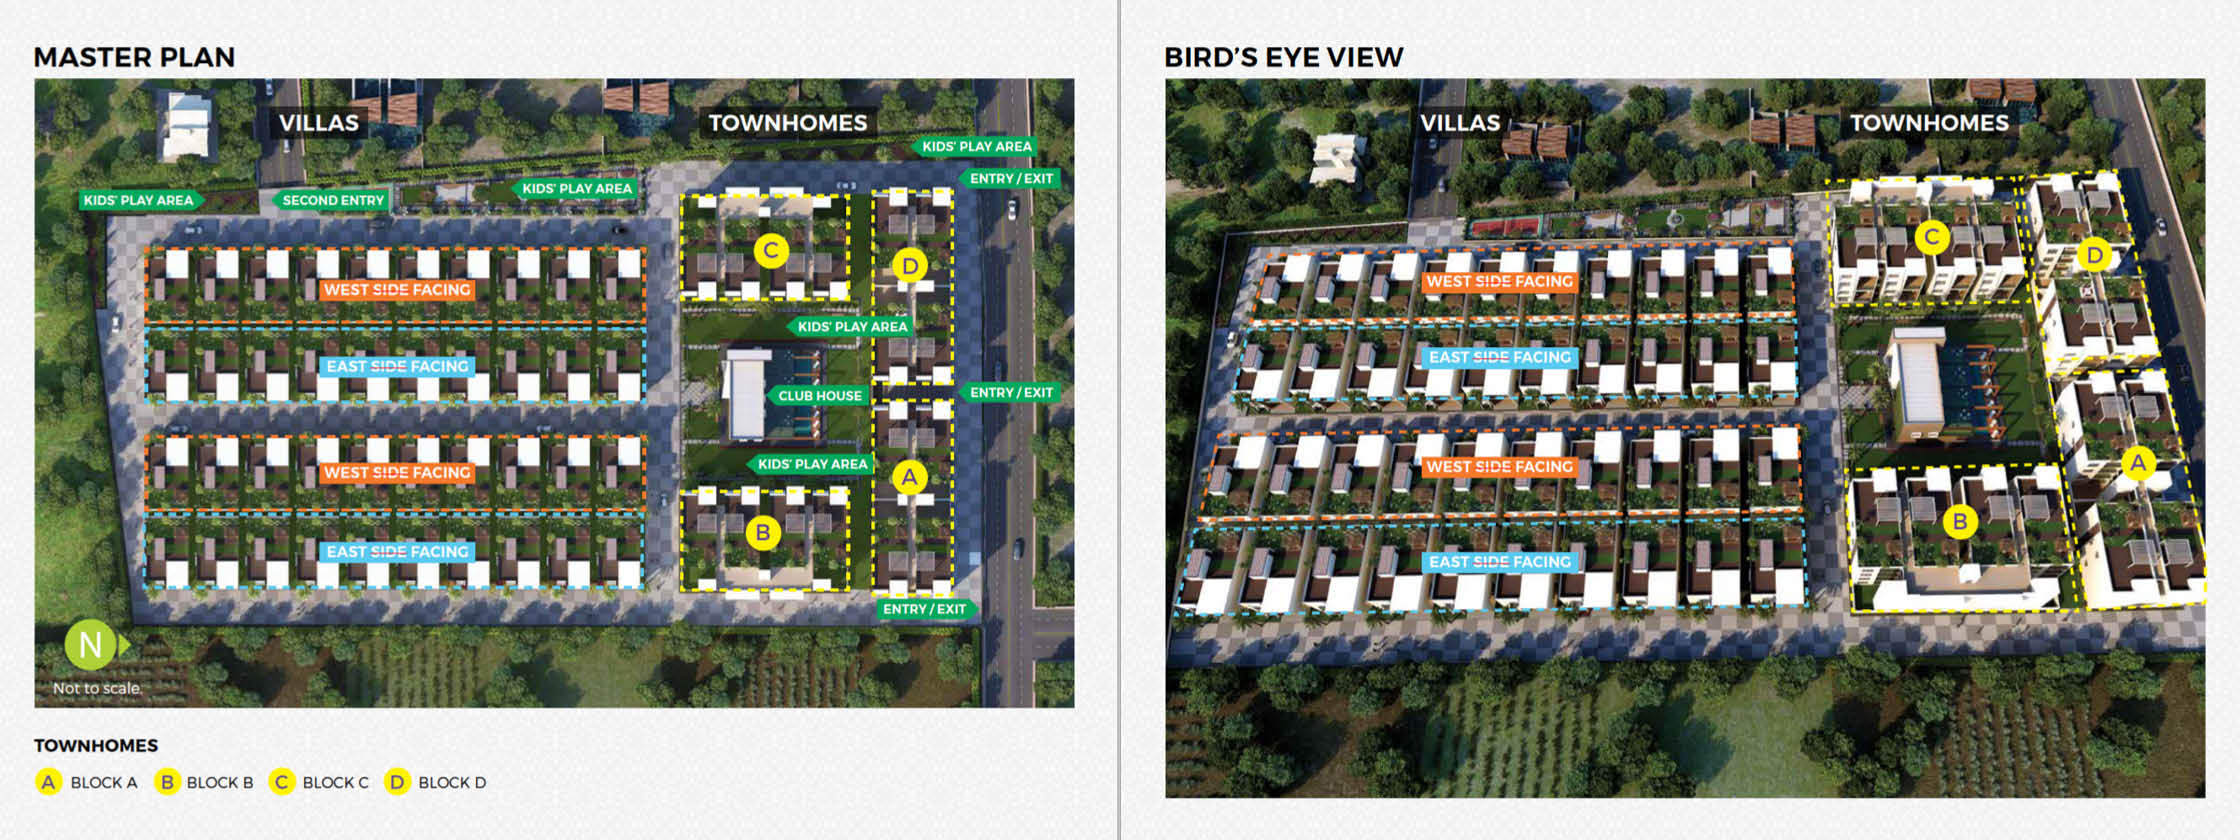 Real Estate Rezonant Design ARD Saavan Brochure Design 19